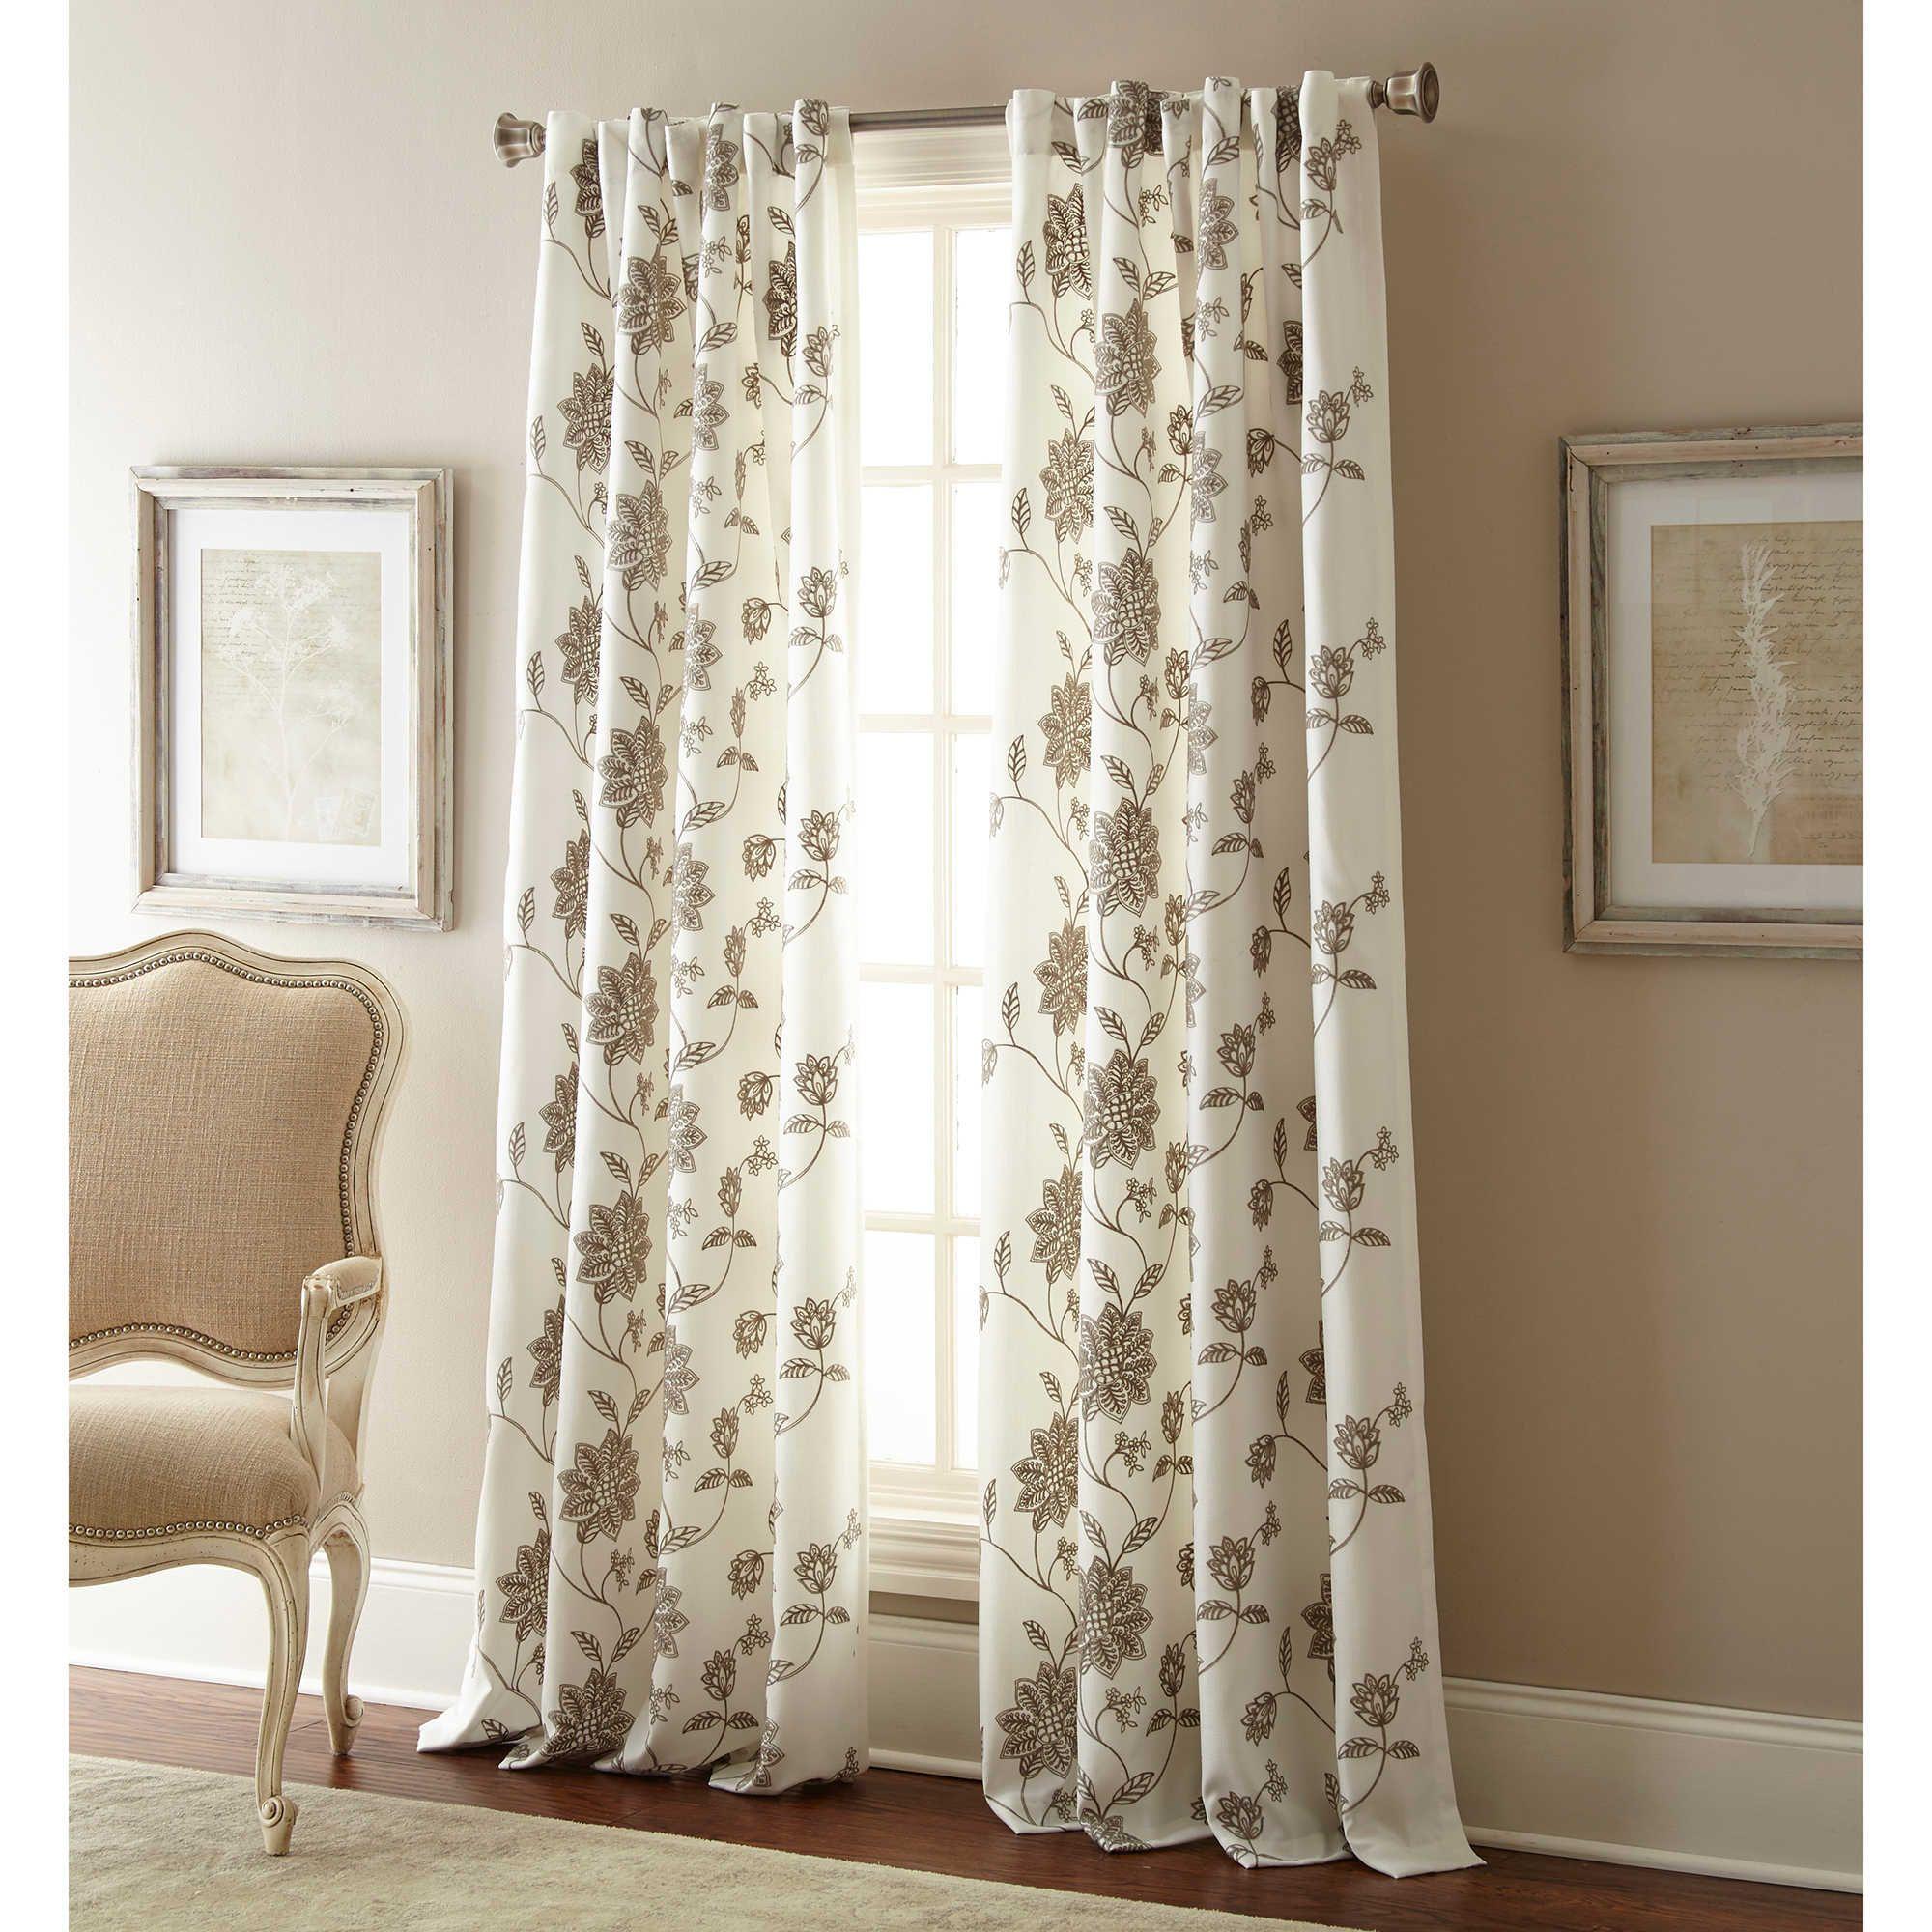 Jaylynn inch rod pocket embroidered window curtain panel in grey